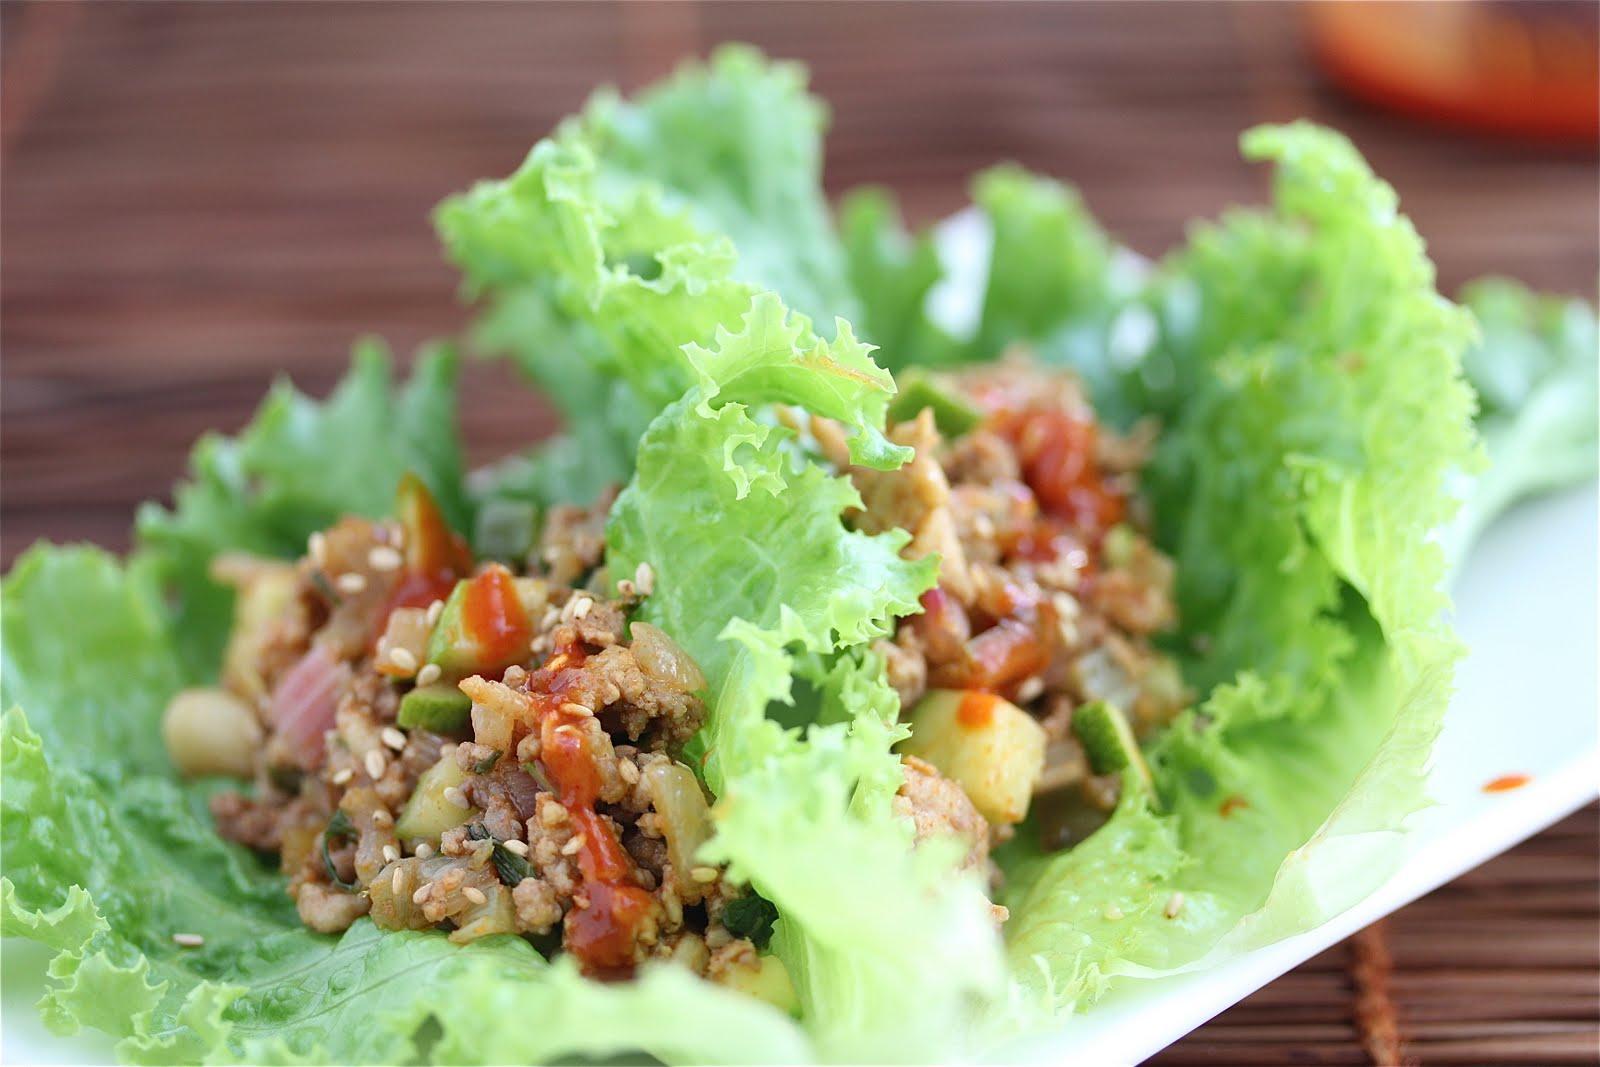 Summer vegetable korean lettuce wraps recipe jeanettes healthy living summer vegetable korean lettuce wraps forumfinder Choice Image